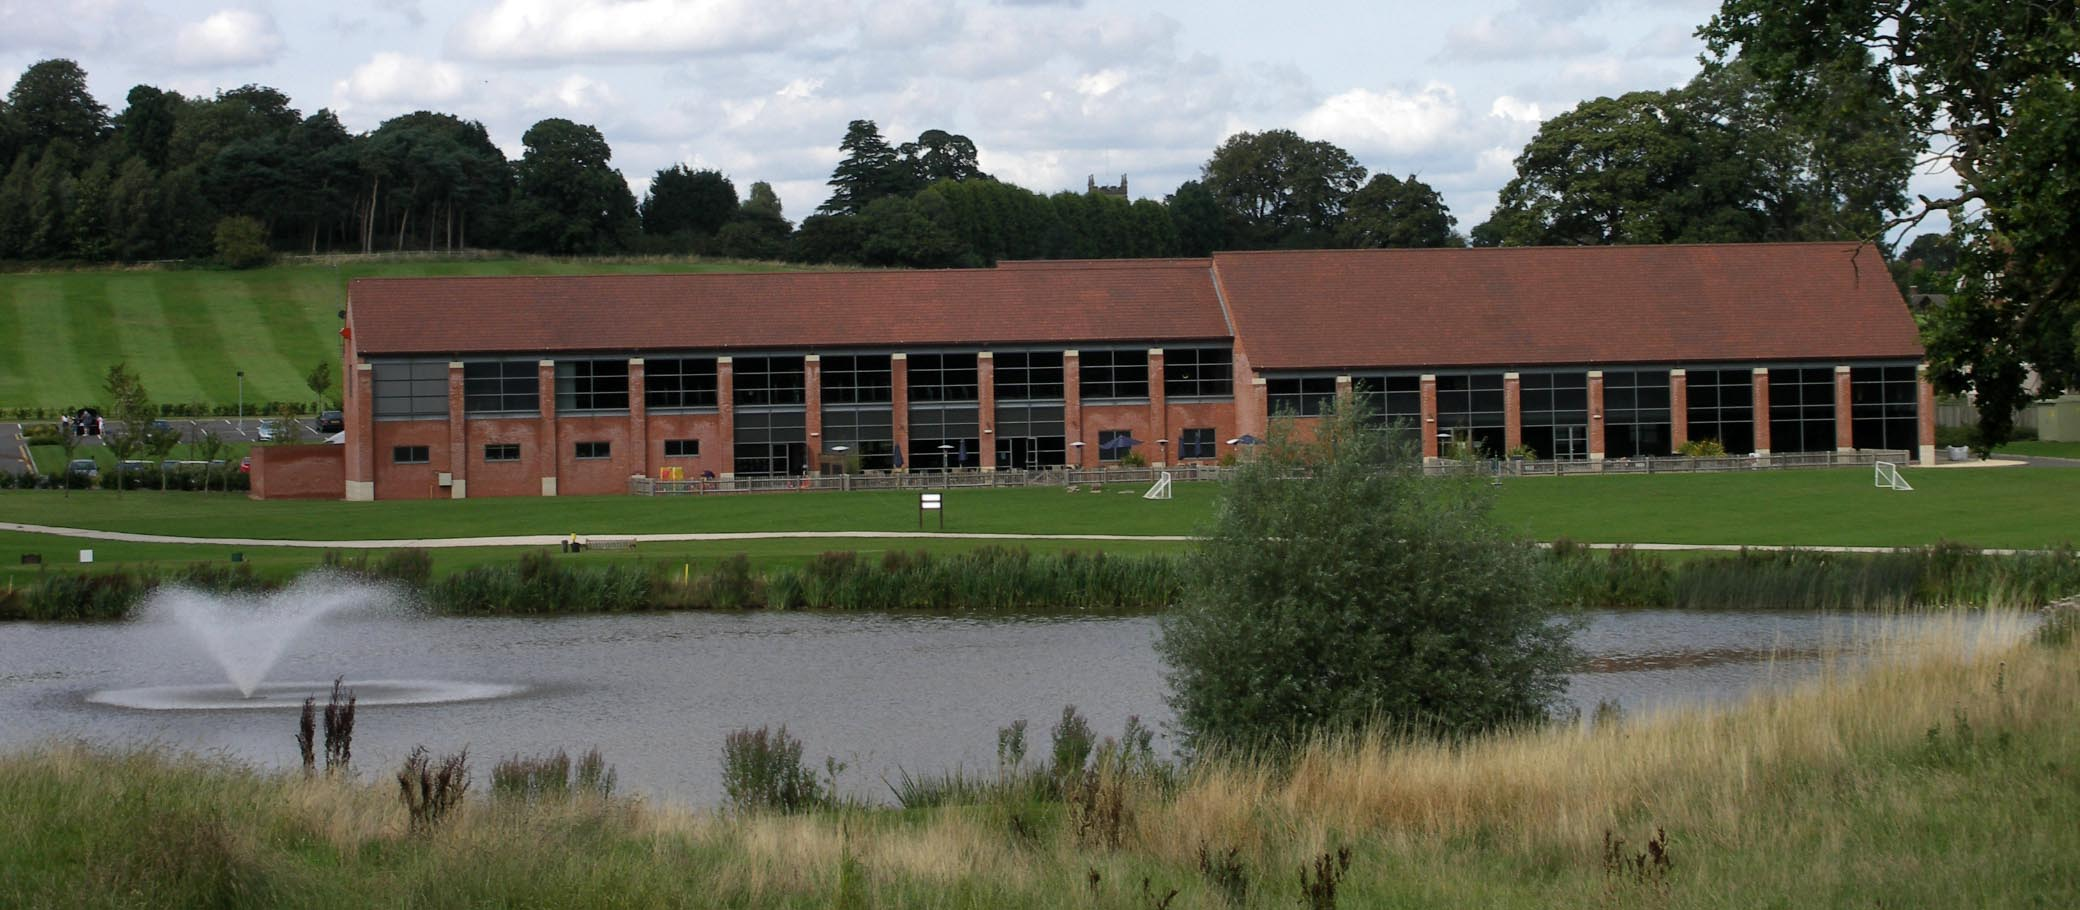 The Warwickshire Health Club